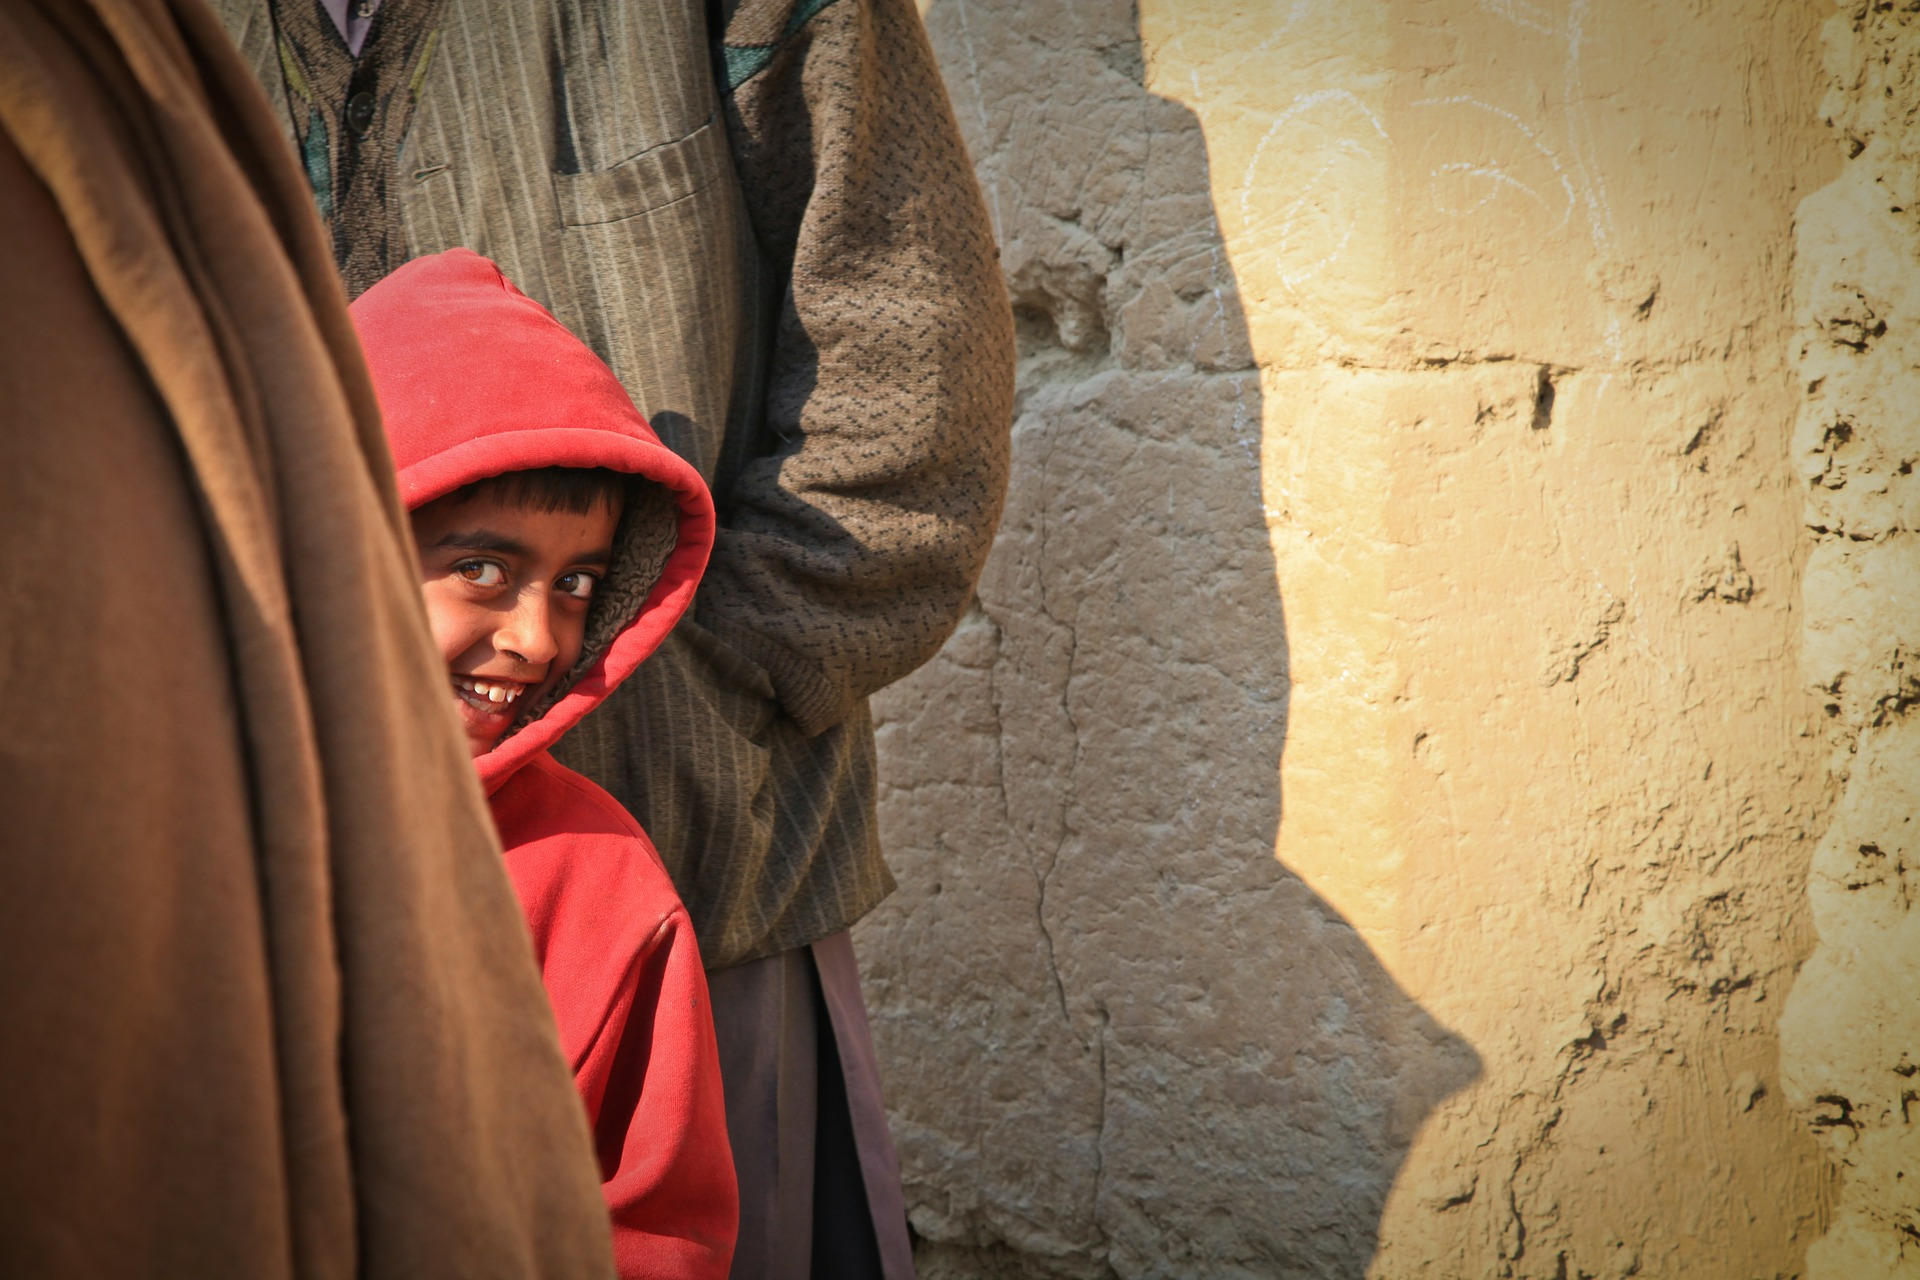 pojke från Afghanistan gömmer sig